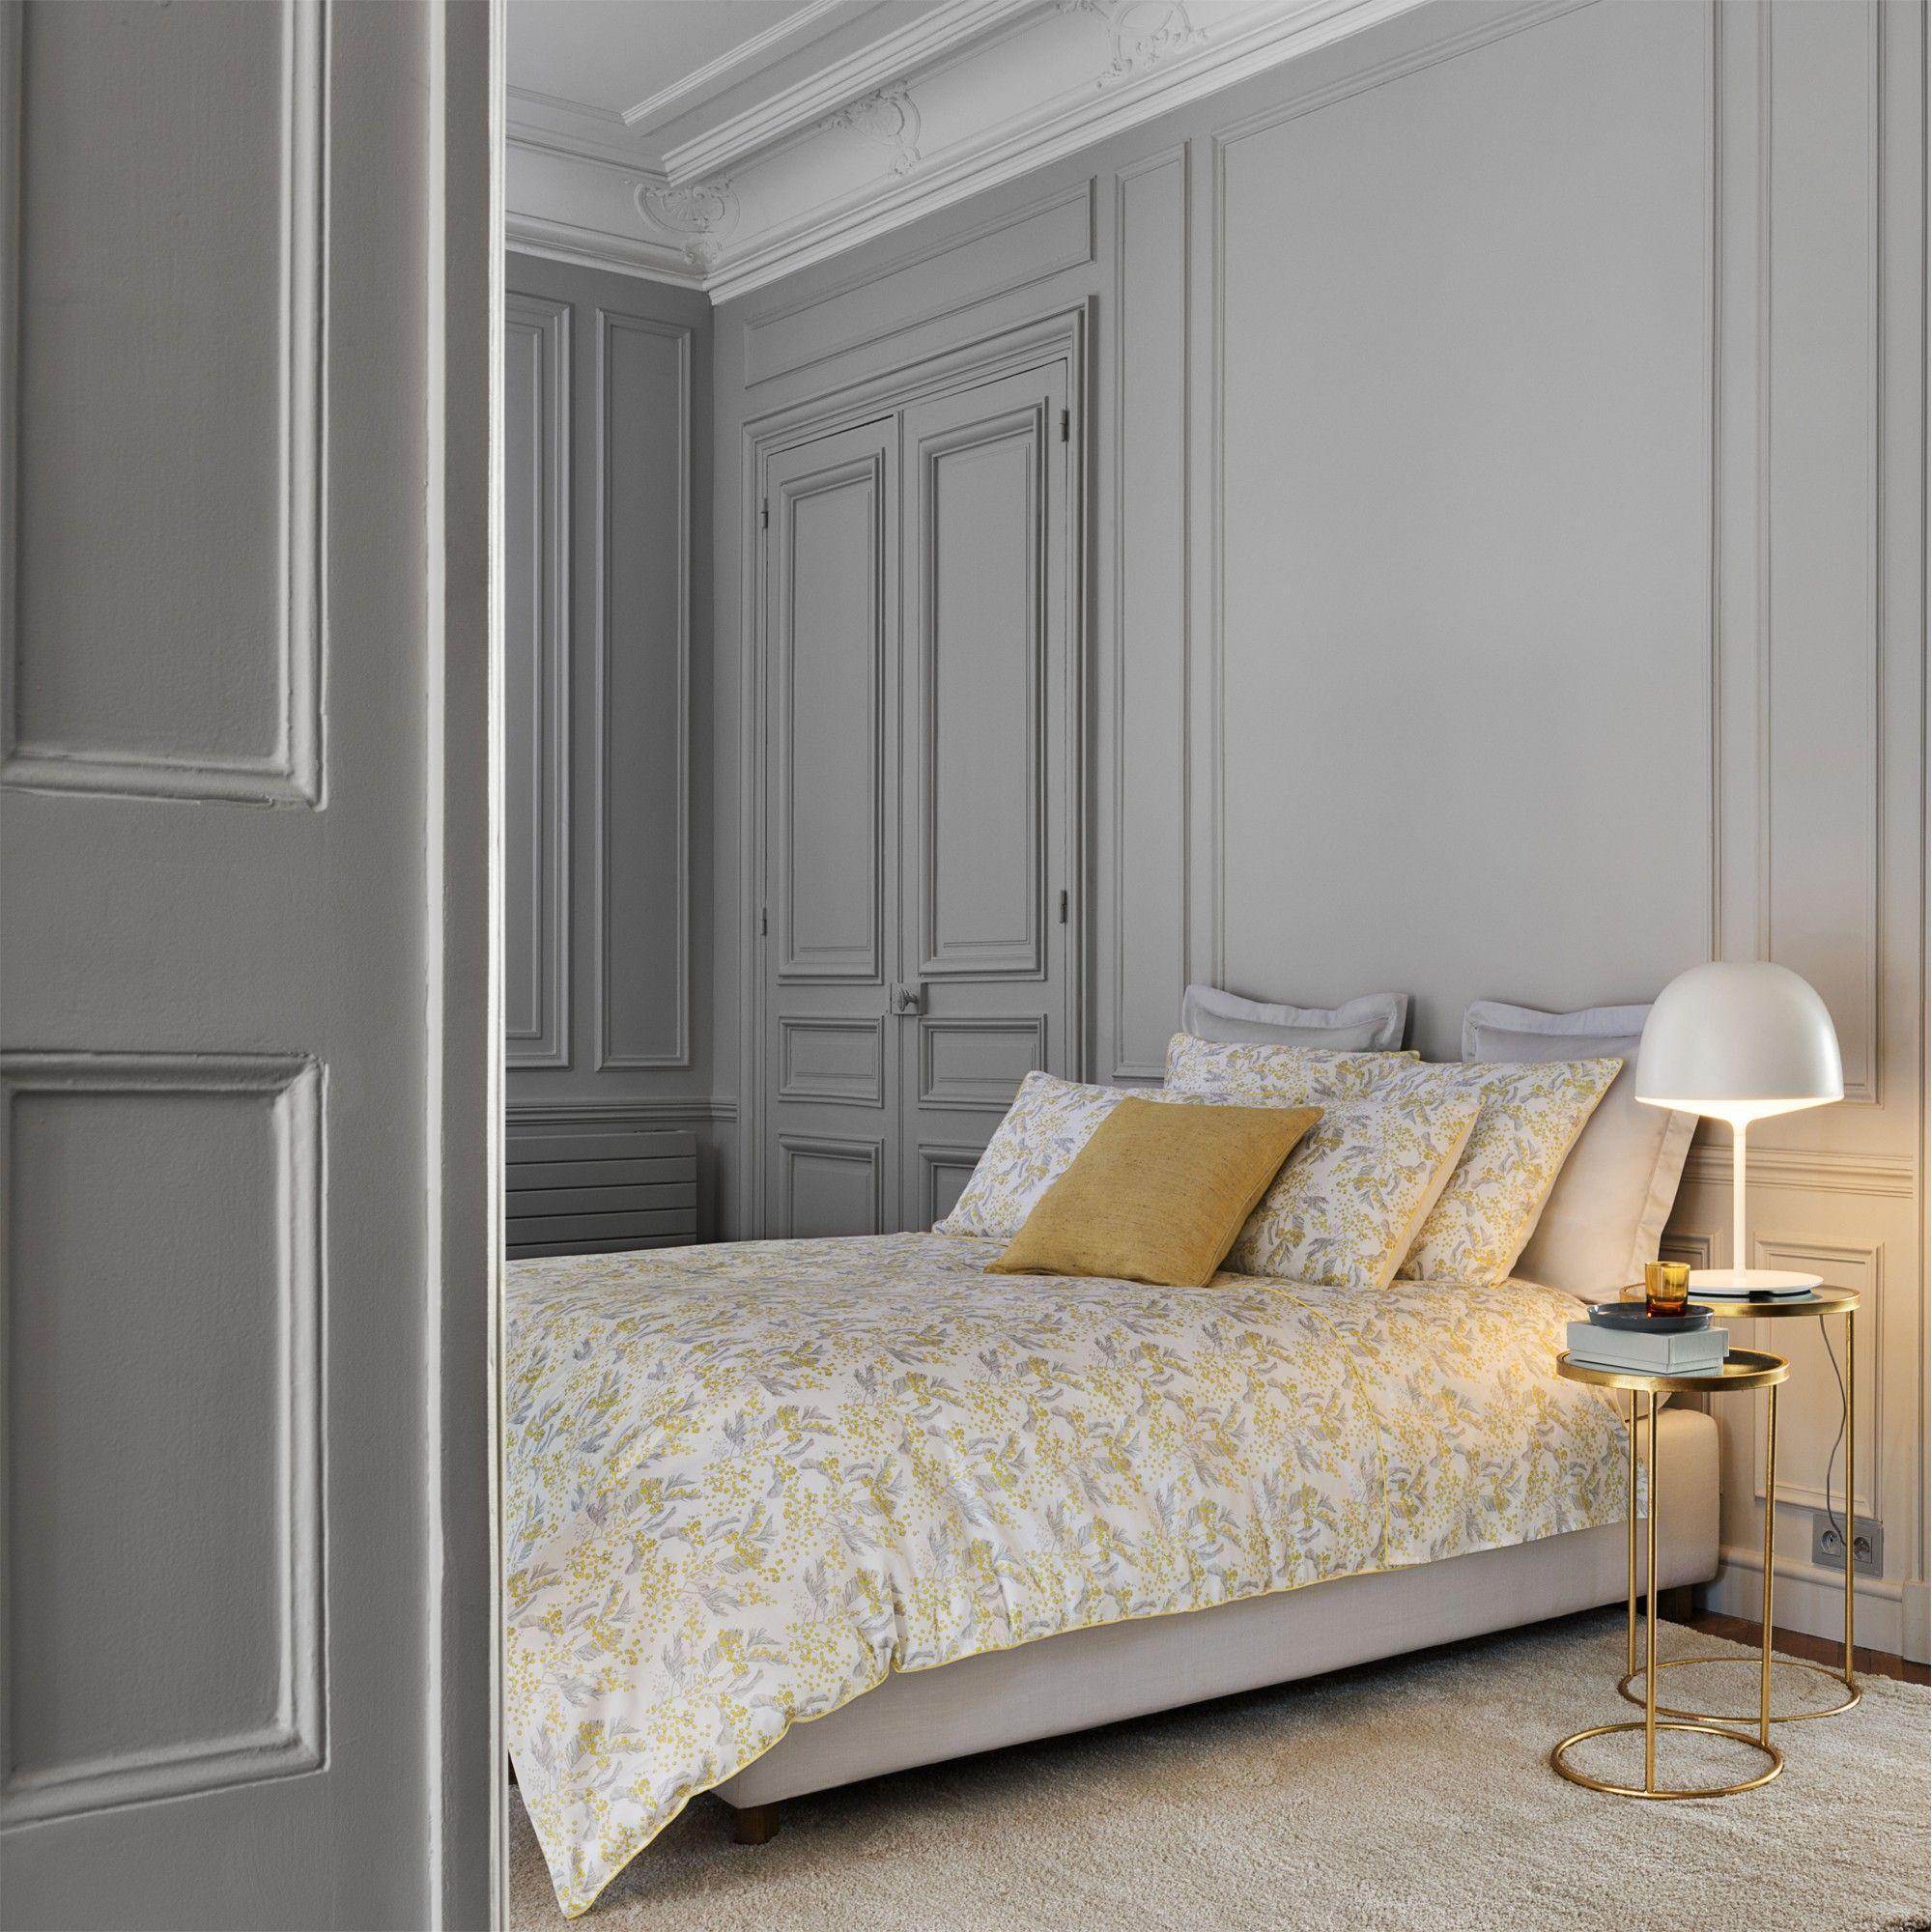 parure de lit 39 mimosa mari e 39 de descamps satin 110 fils cm 100 coton peign longues fibres. Black Bedroom Furniture Sets. Home Design Ideas